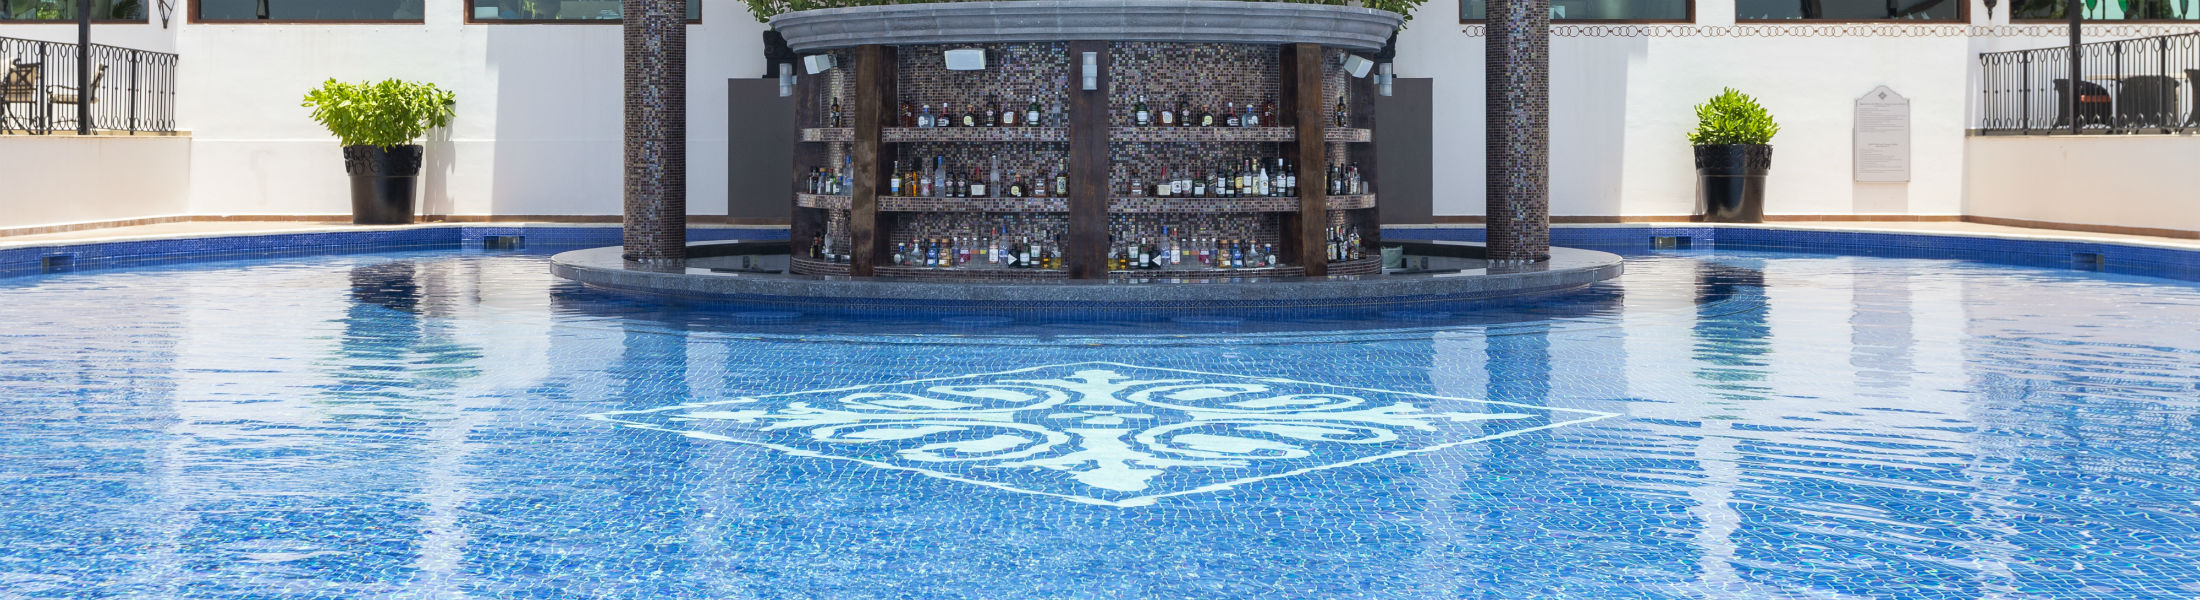 Swim up bar at the Grand Residences Riviera Cancun